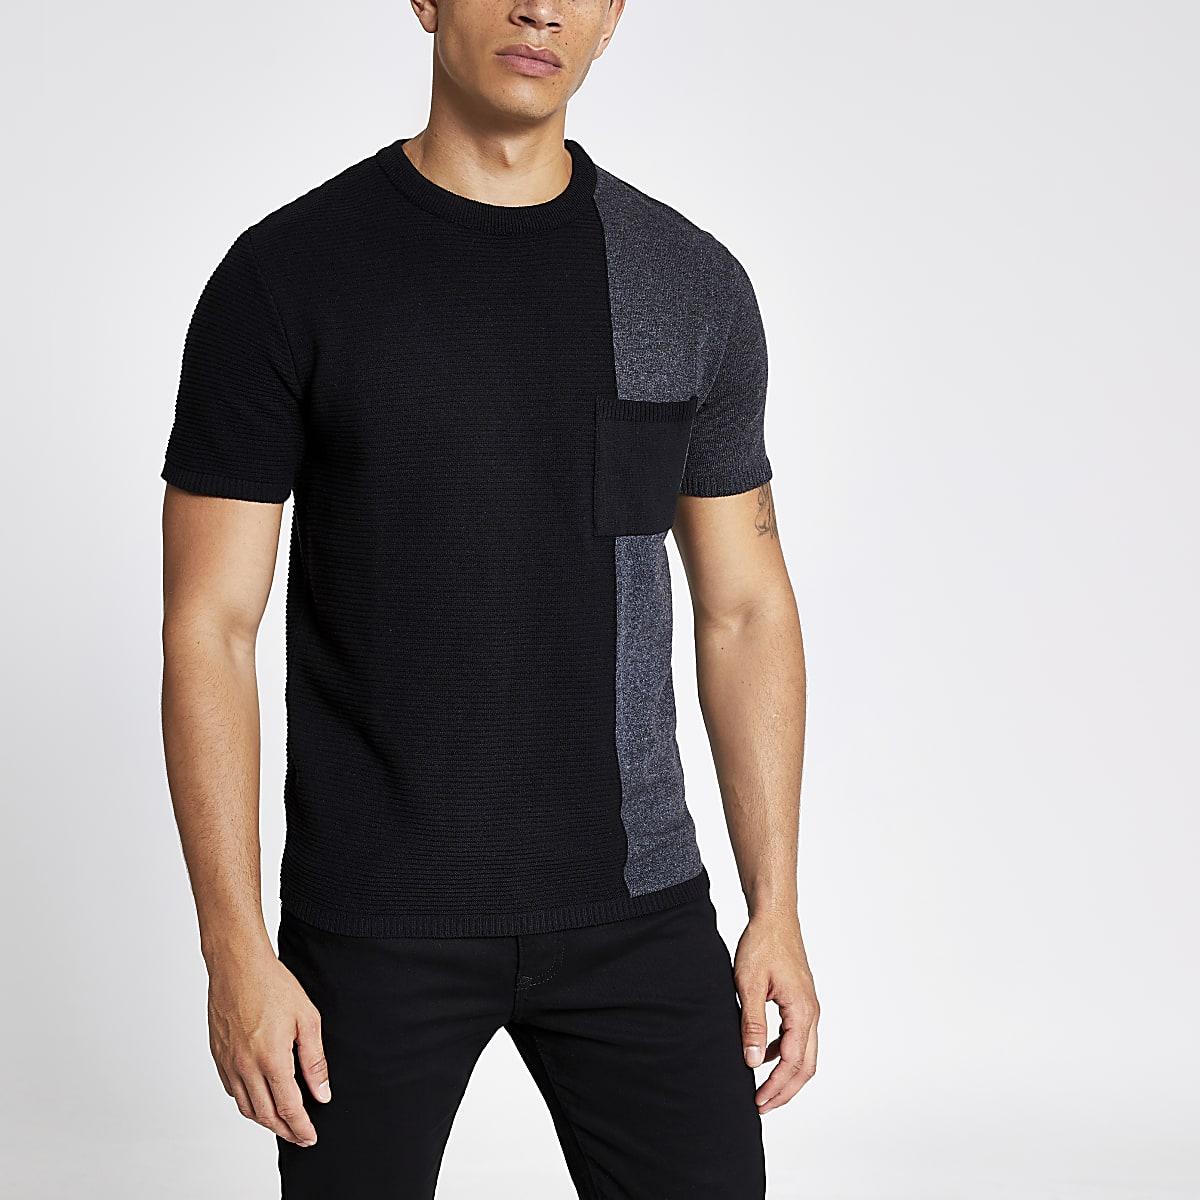 Black block slim fit knitted T-shirt